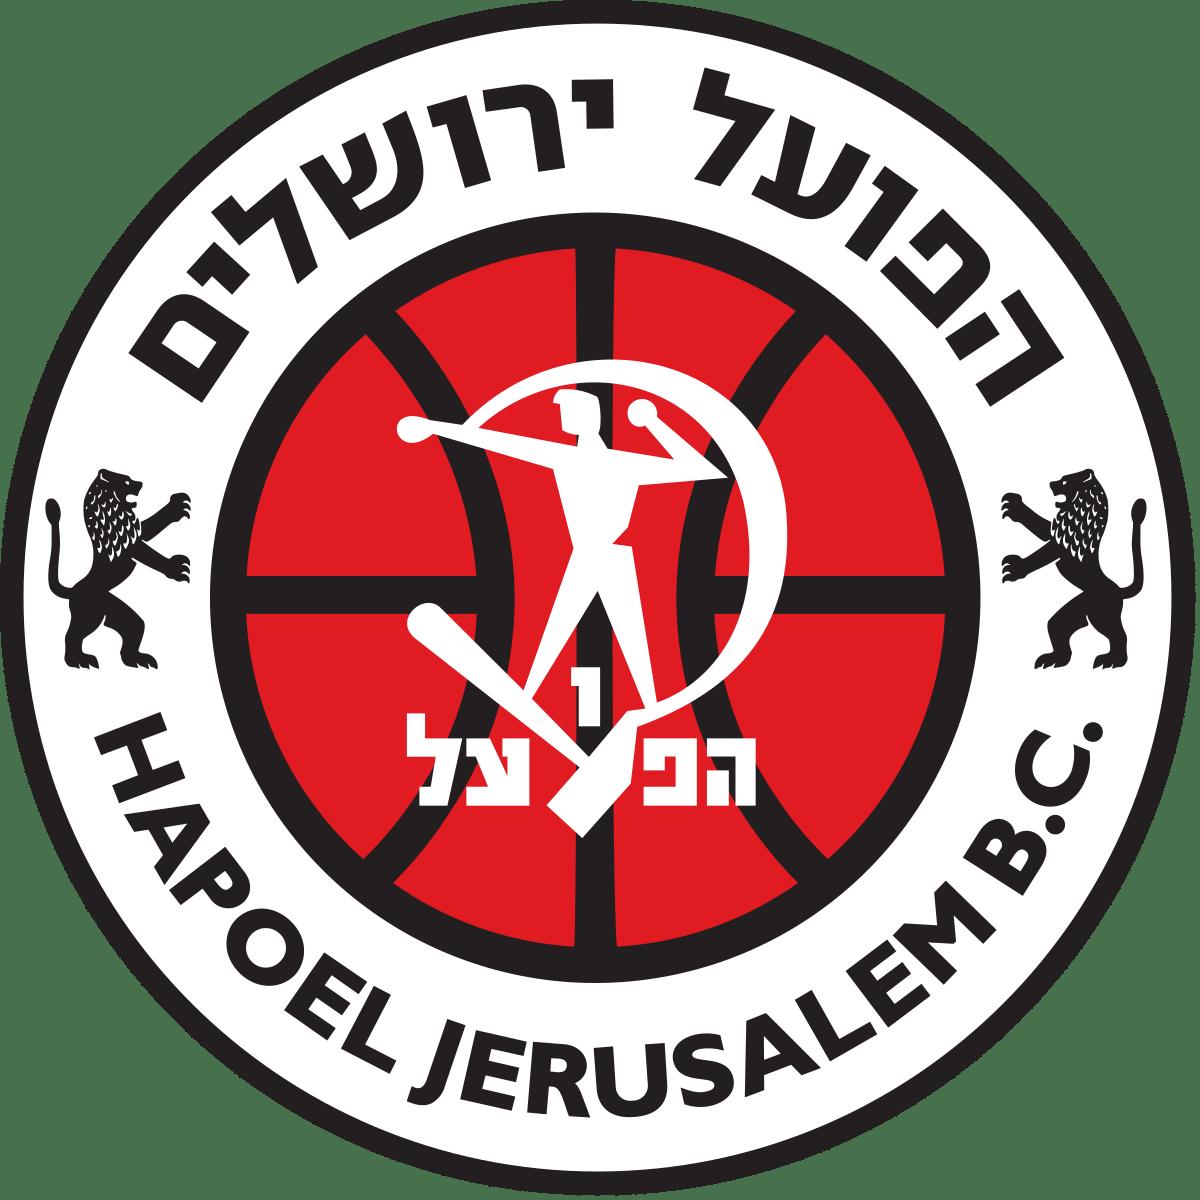 Hapoel_Jerusalem_Basketball_Club_(logo)